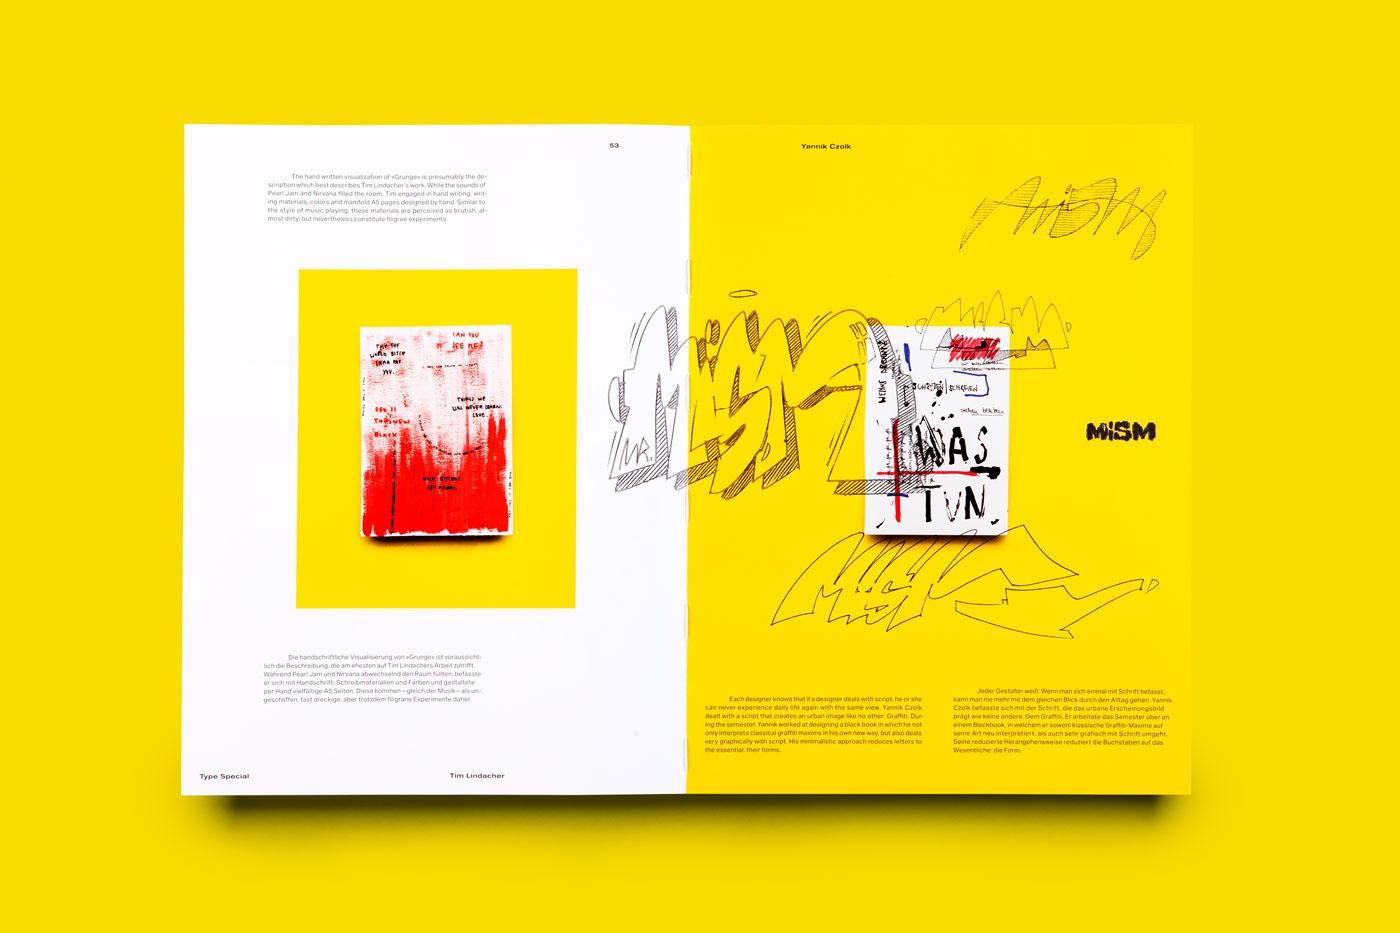 Komma mannheim International issue Shutterstock graphic design editorial peter bankov omid nemalhabib atolón de mororoa eps51 Koichi Sato ODED EZER Saki Mafundikwa